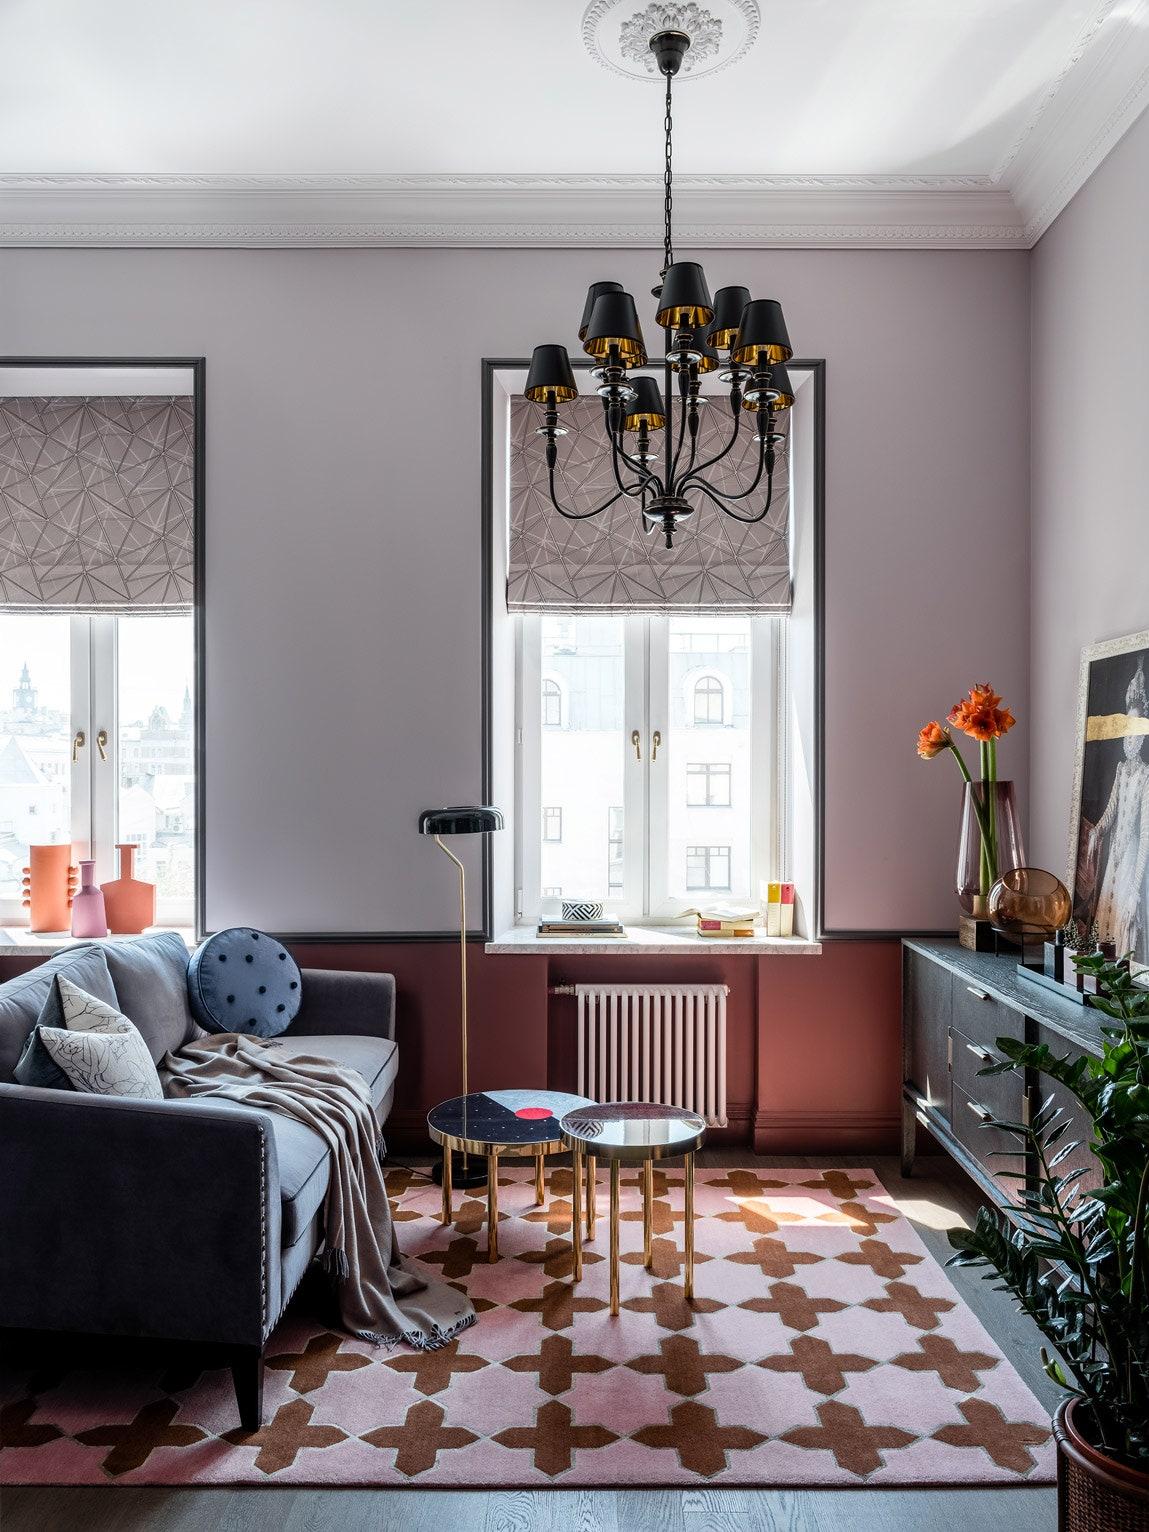 37 . . Coswick Dantone Home ADecor MarkPatlisStudio VEEVO KARE Moscow enere.it Togas DesignBoom ...